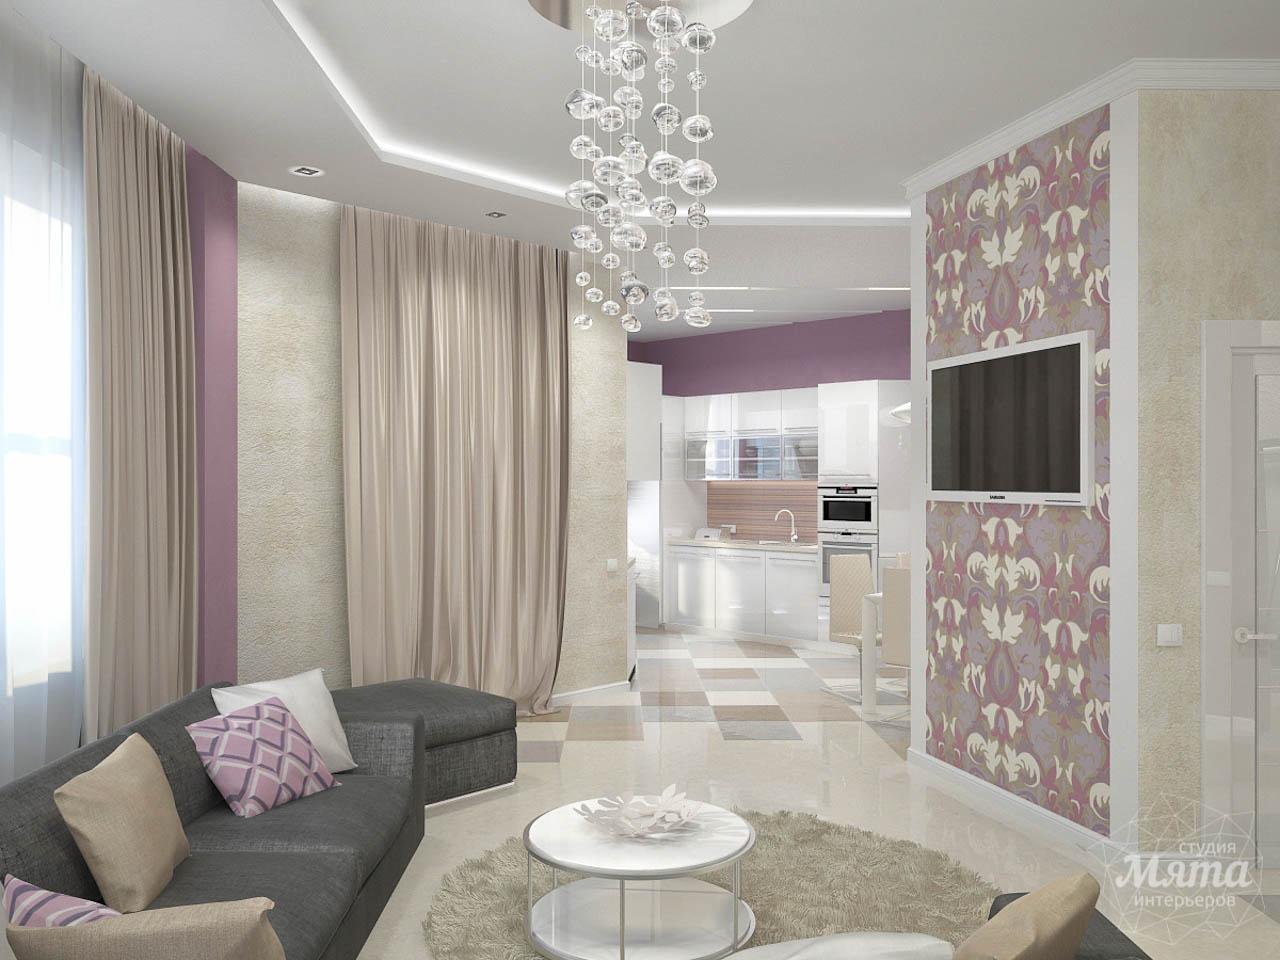 Дизайн интерьера и ремонт трехкомнатной квартиры по ул. Чкалова 124 img1270967251